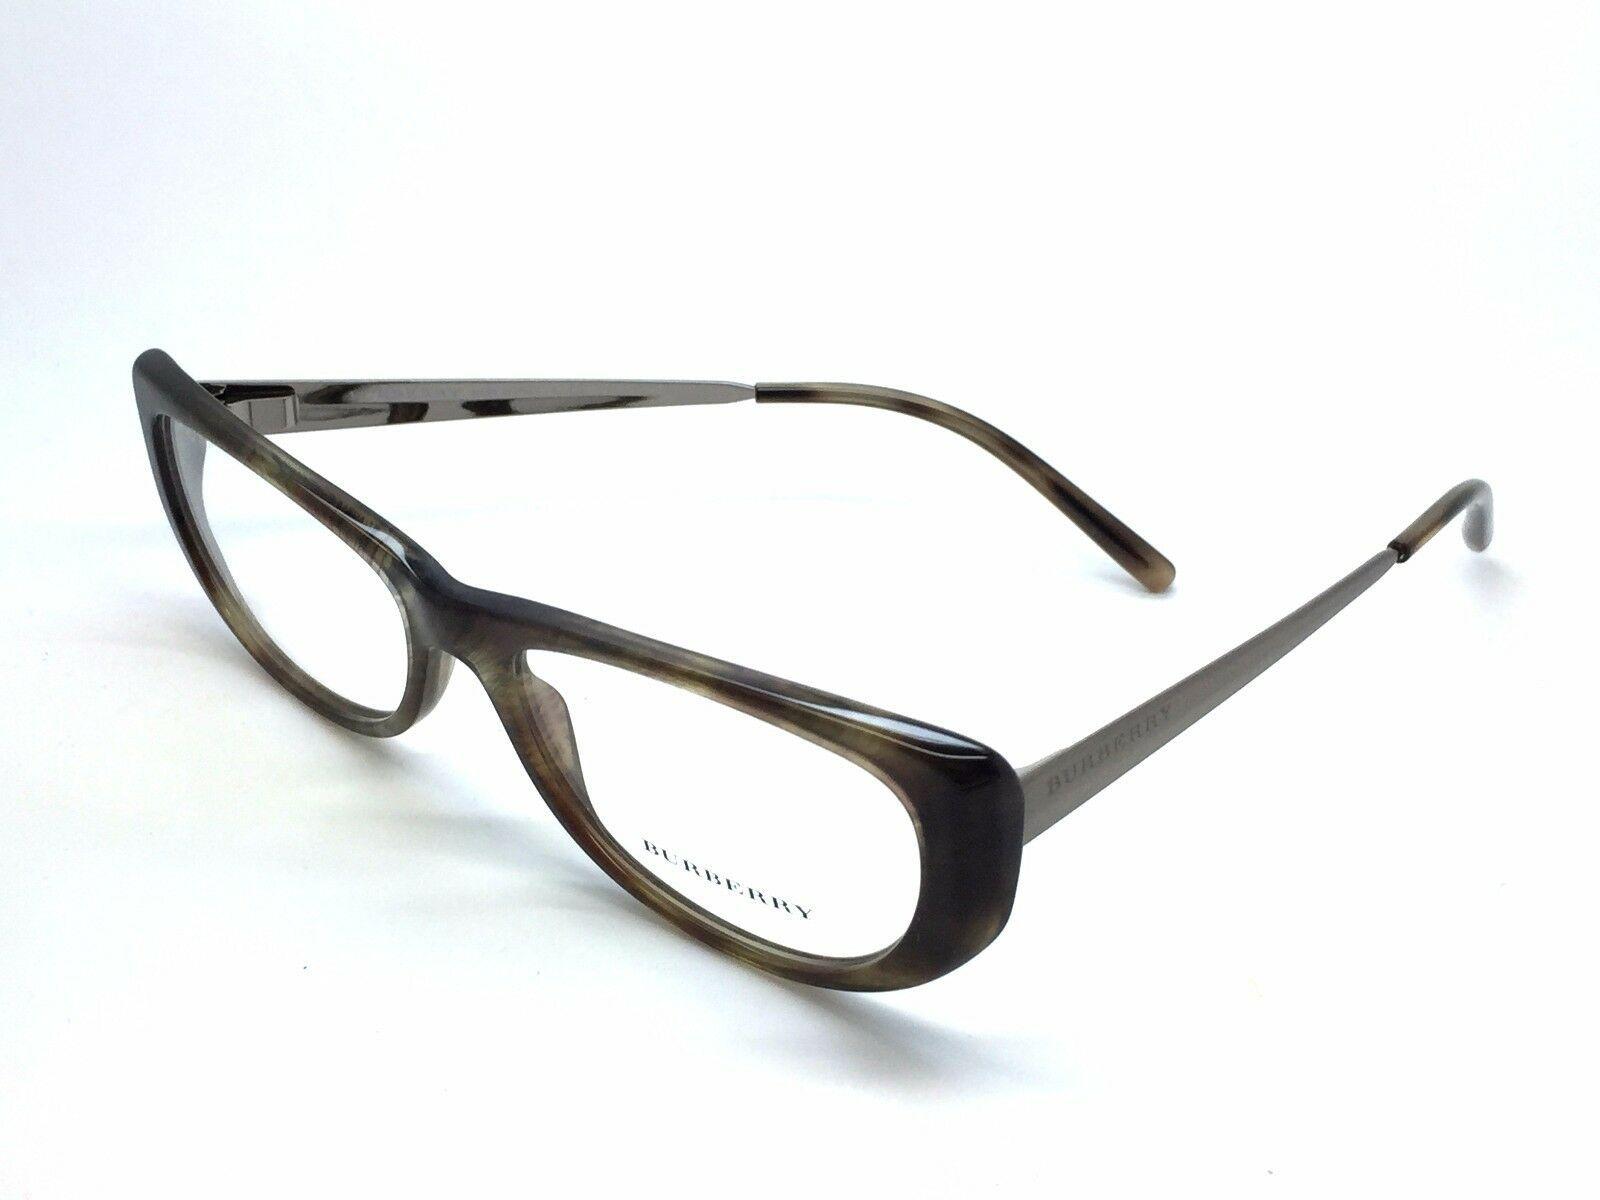 2168 3472 New Authentic BURBERRY EYEGLASSES FRAME 53-16-135 Italy frame  - $77.57